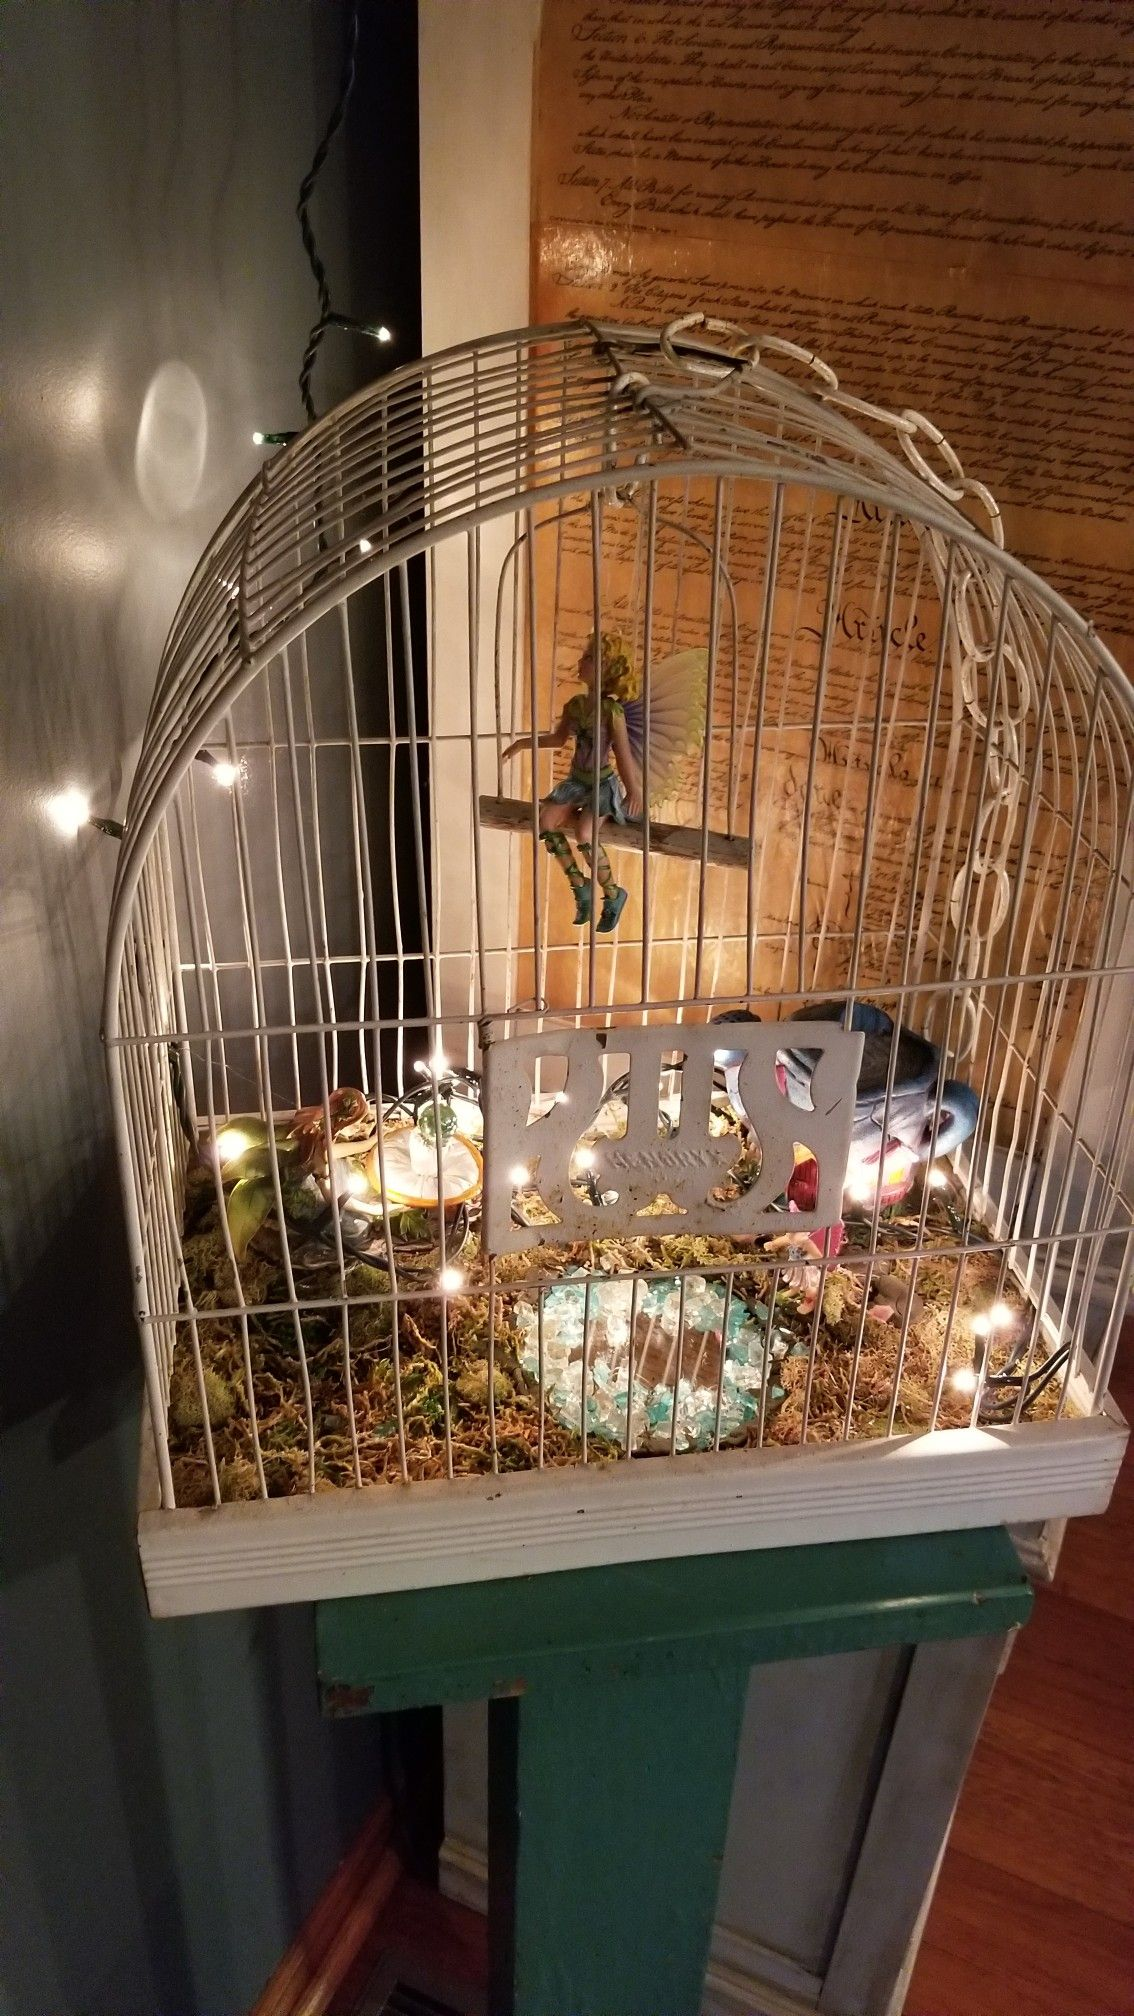 birdcage betting online